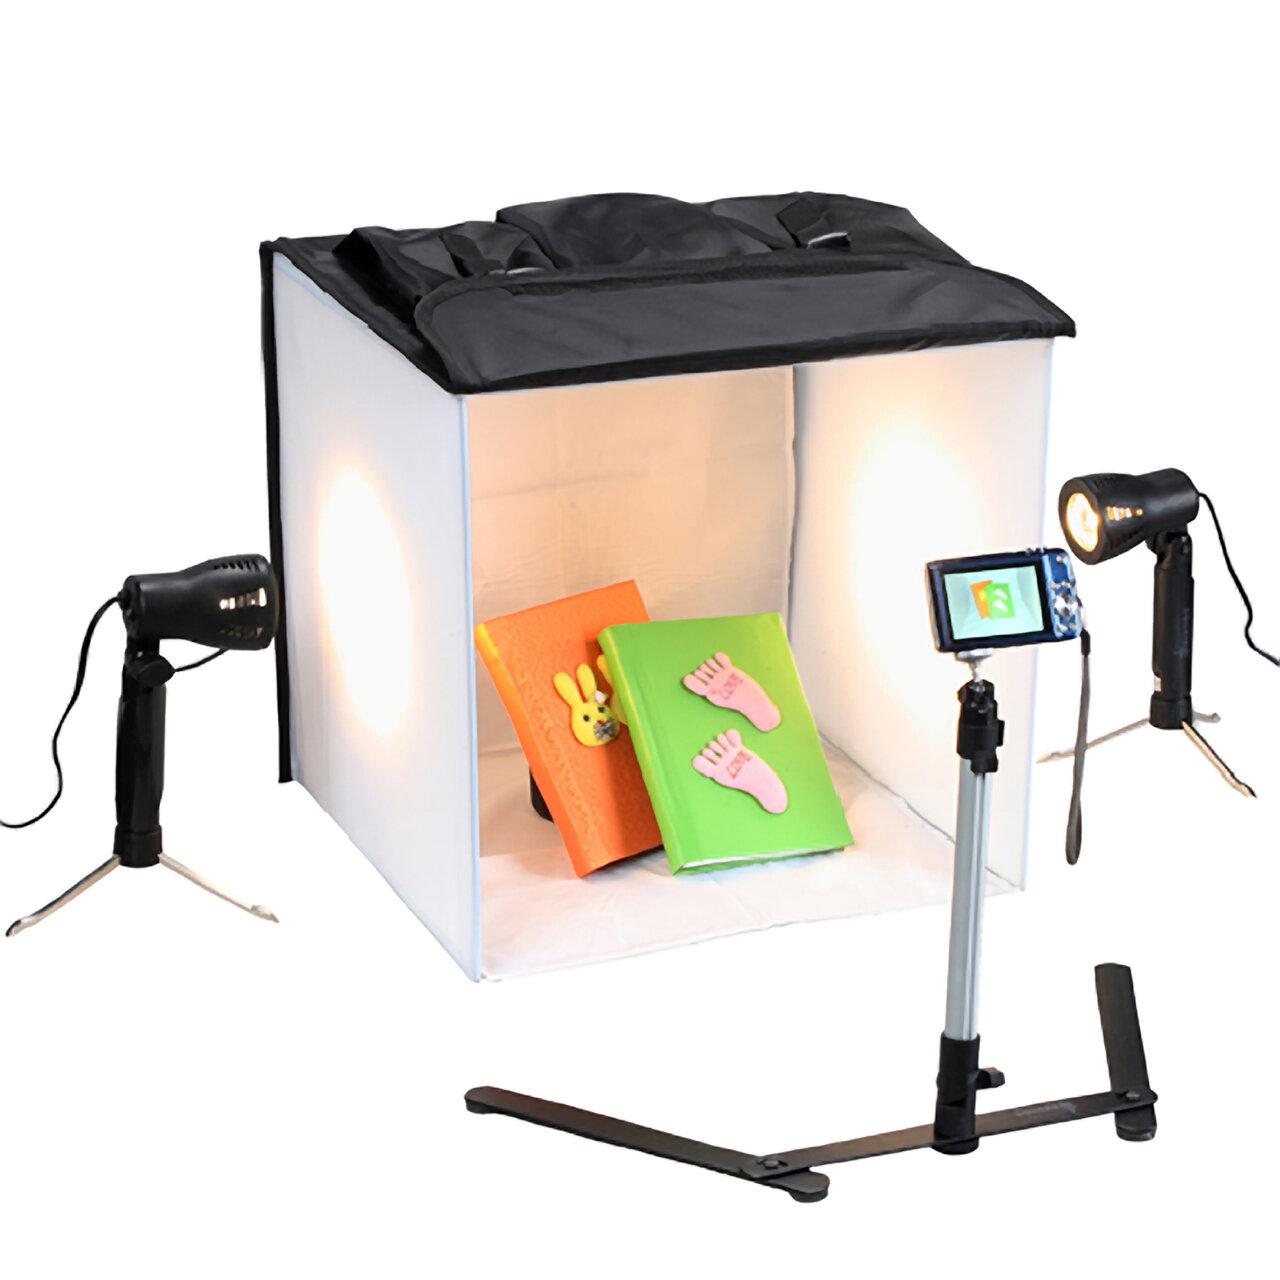 Square Perfect Studio In Box Light Tent Cube Reviews Wayfair